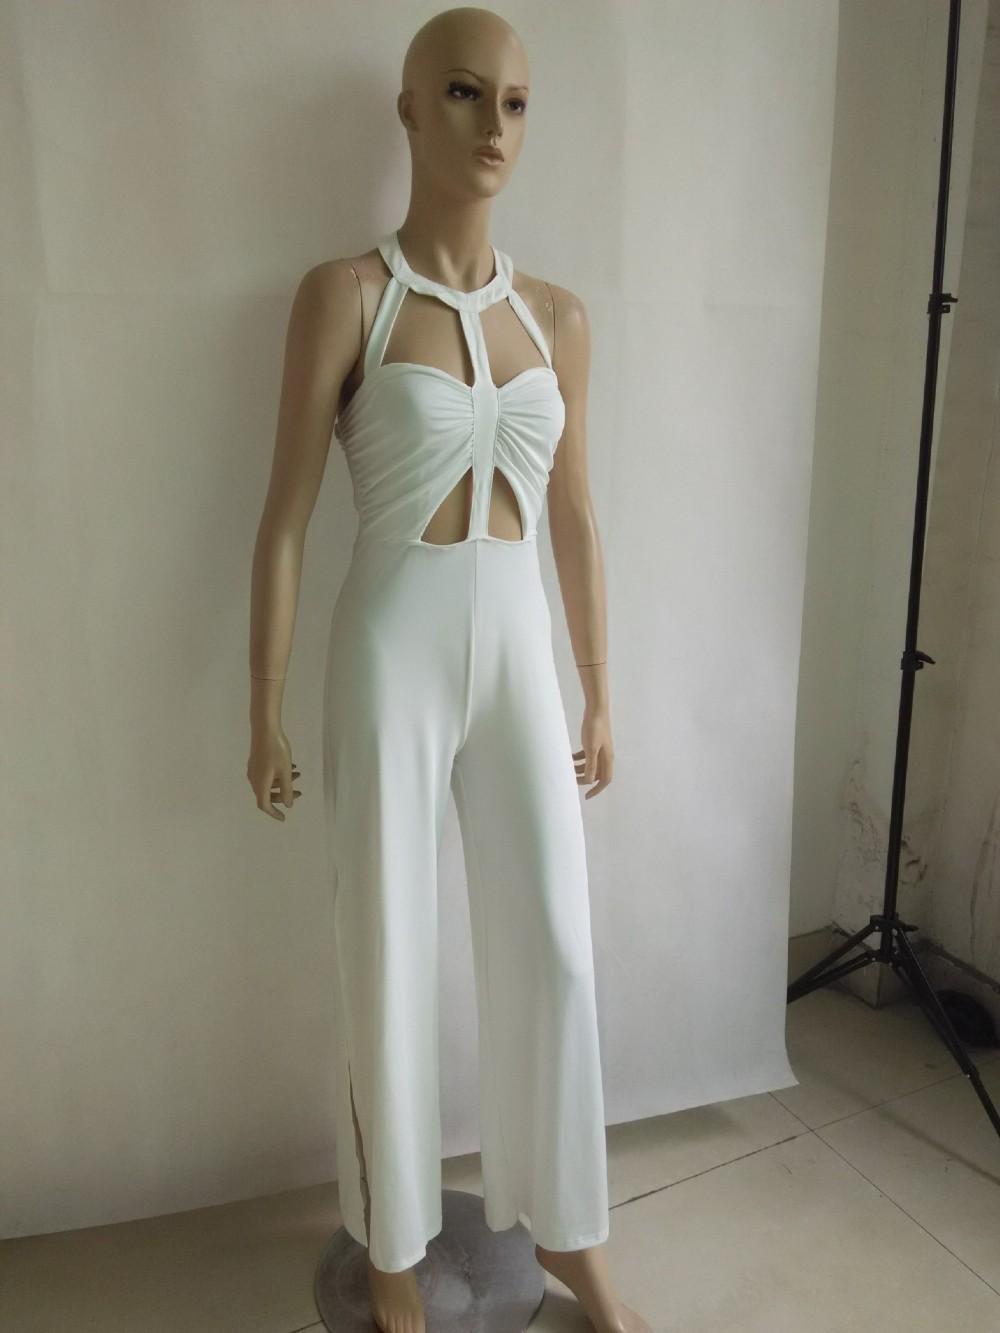 e53d16be145 Brand White Rompers Women Jumpsuit Sexy Split Pants Bodysuit ...